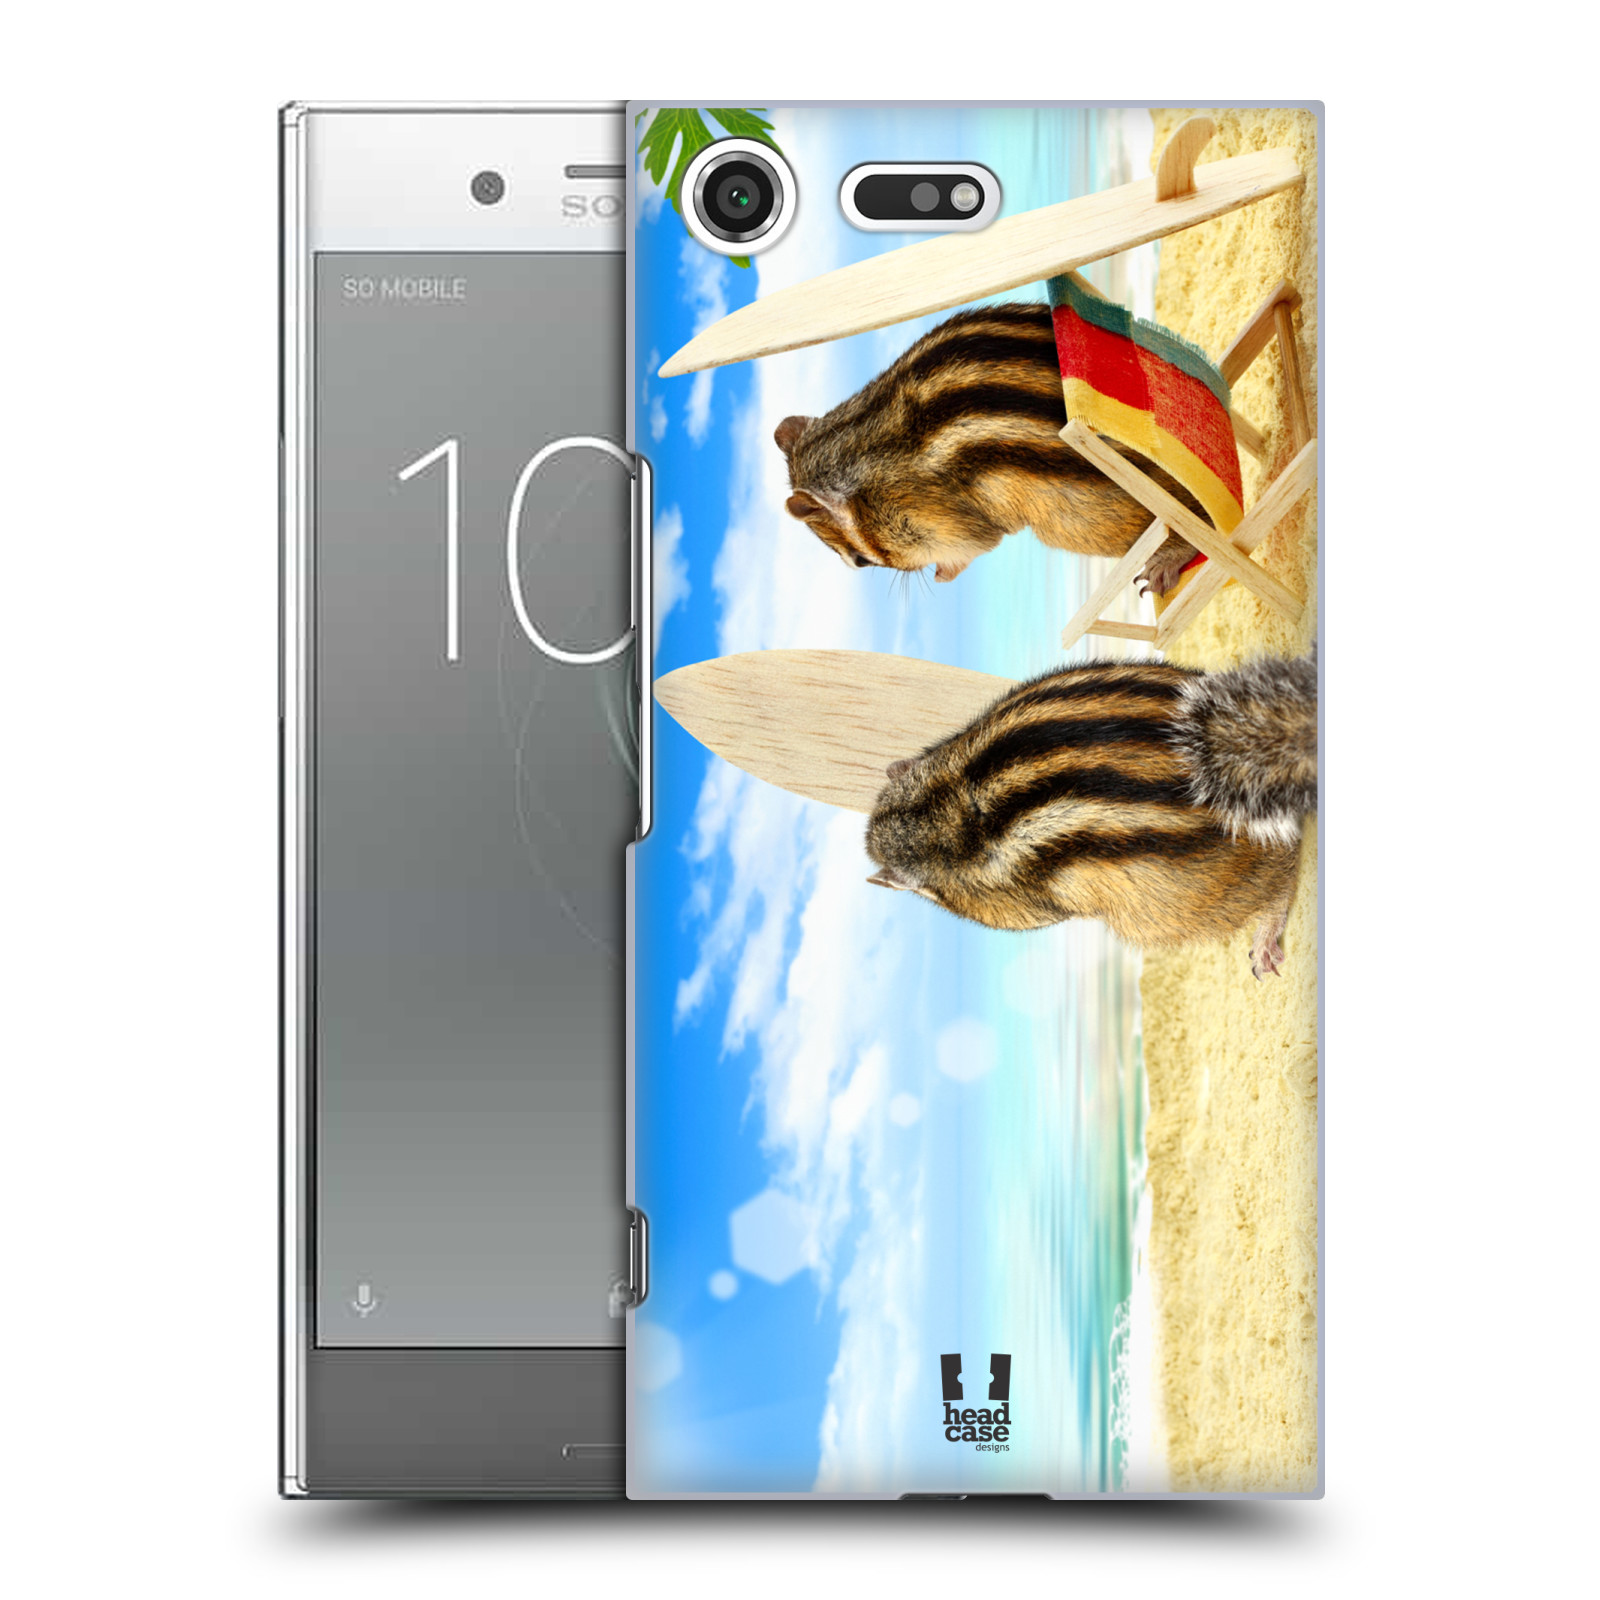 HEAD CASE plastový obal na mobil Sony Xperia XZ PREMIUM vzor Legrační zvířátka veverky surfaři u moře